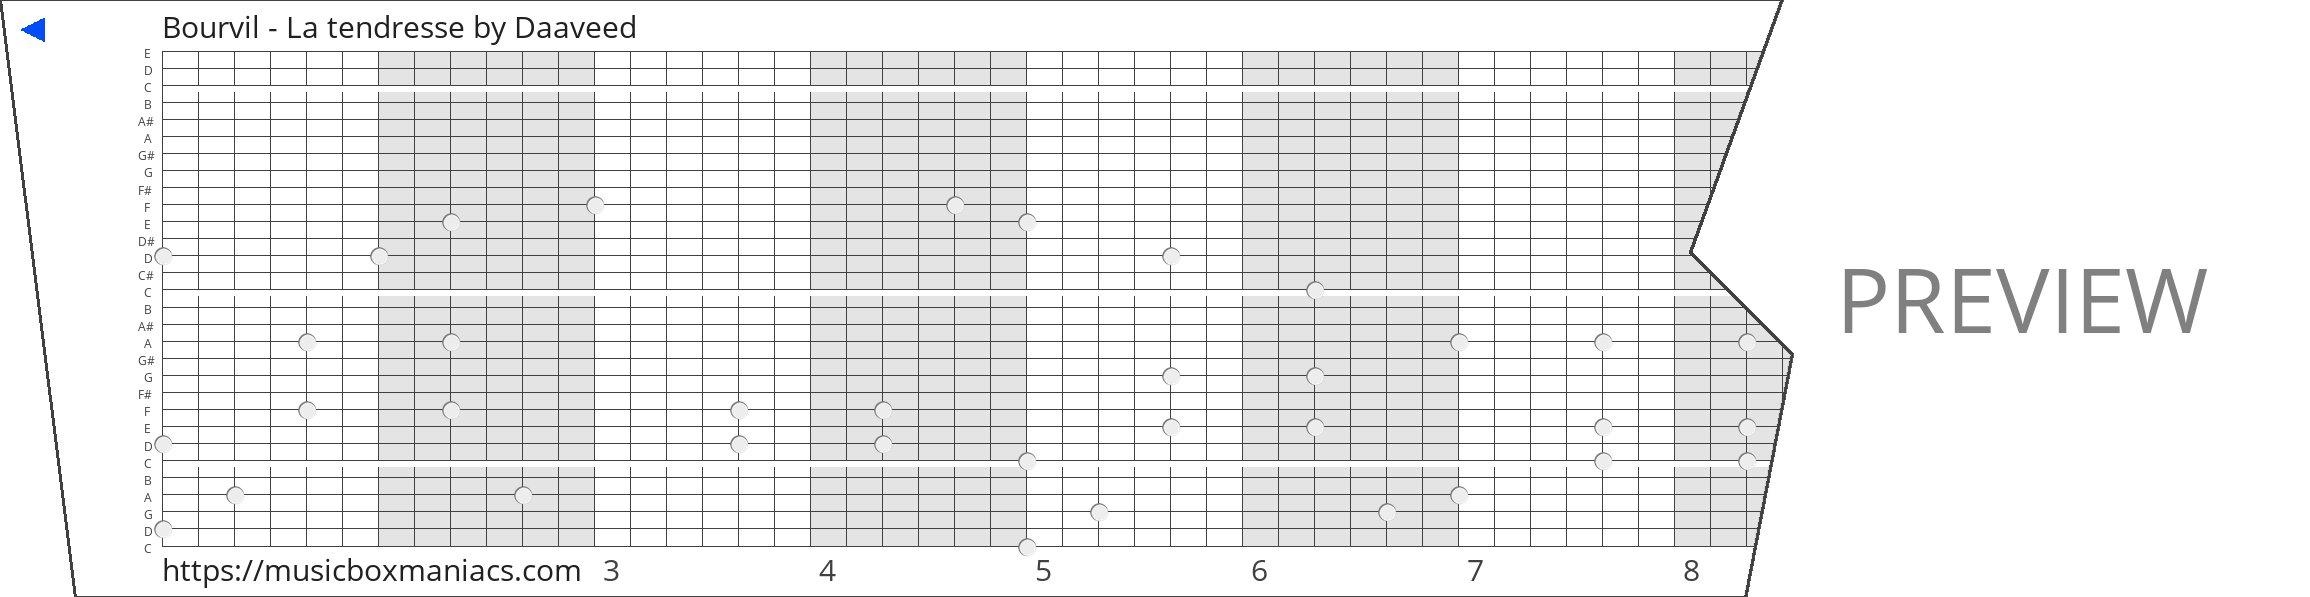 Bourvil - La tendresse 30 note music box paper strip